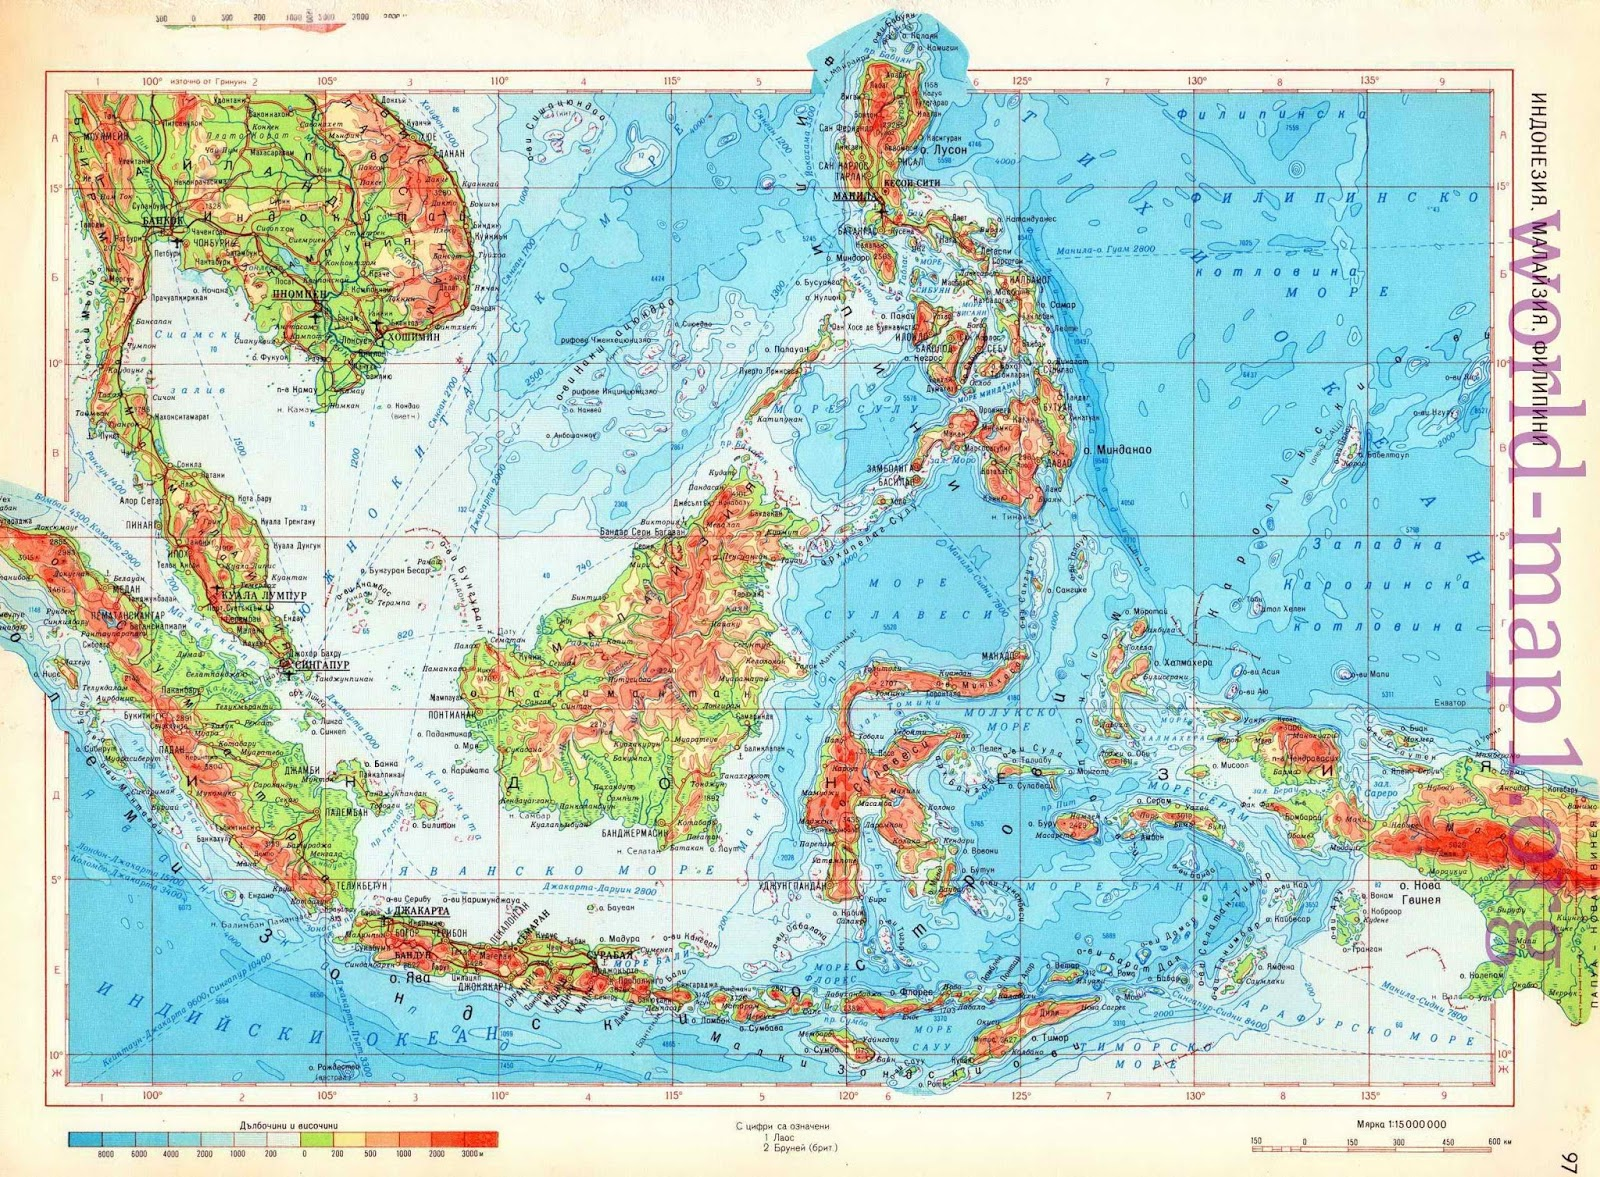 Kumpulan Animasi Peta Indonesia Bergerak Kantor Meme Gambar Real Madrid